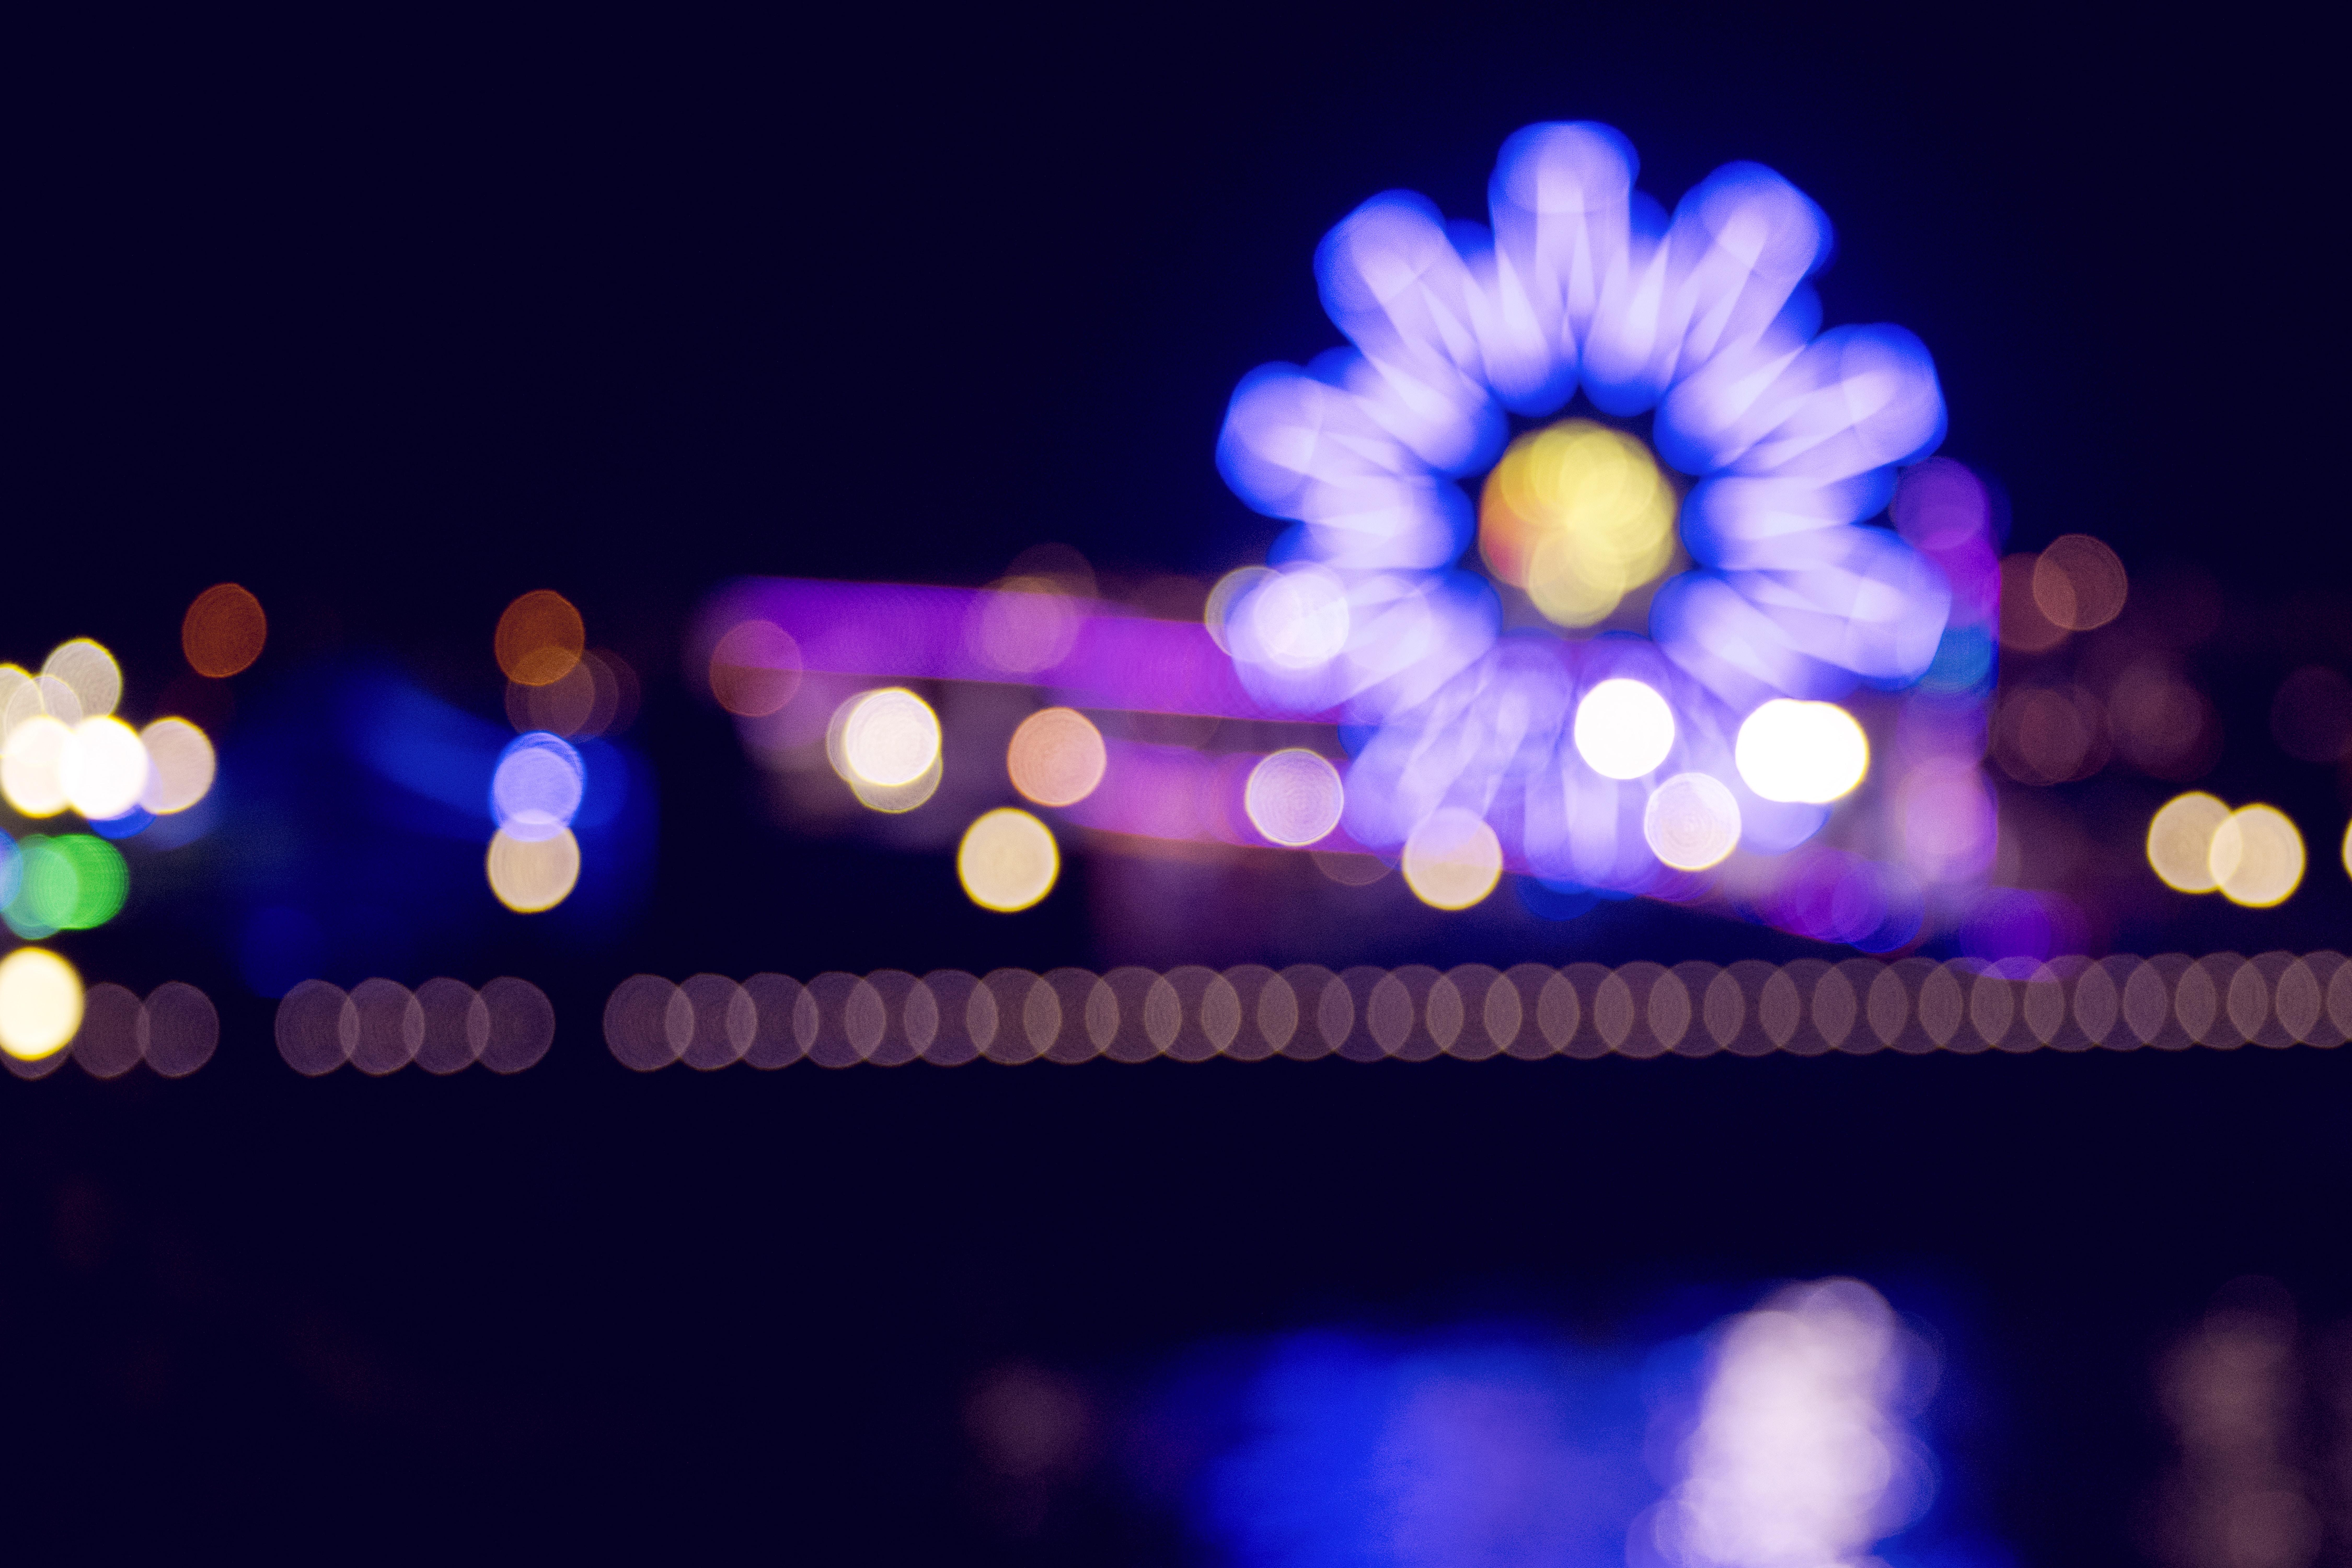 bokeh photography of ferris wheel during nighttime